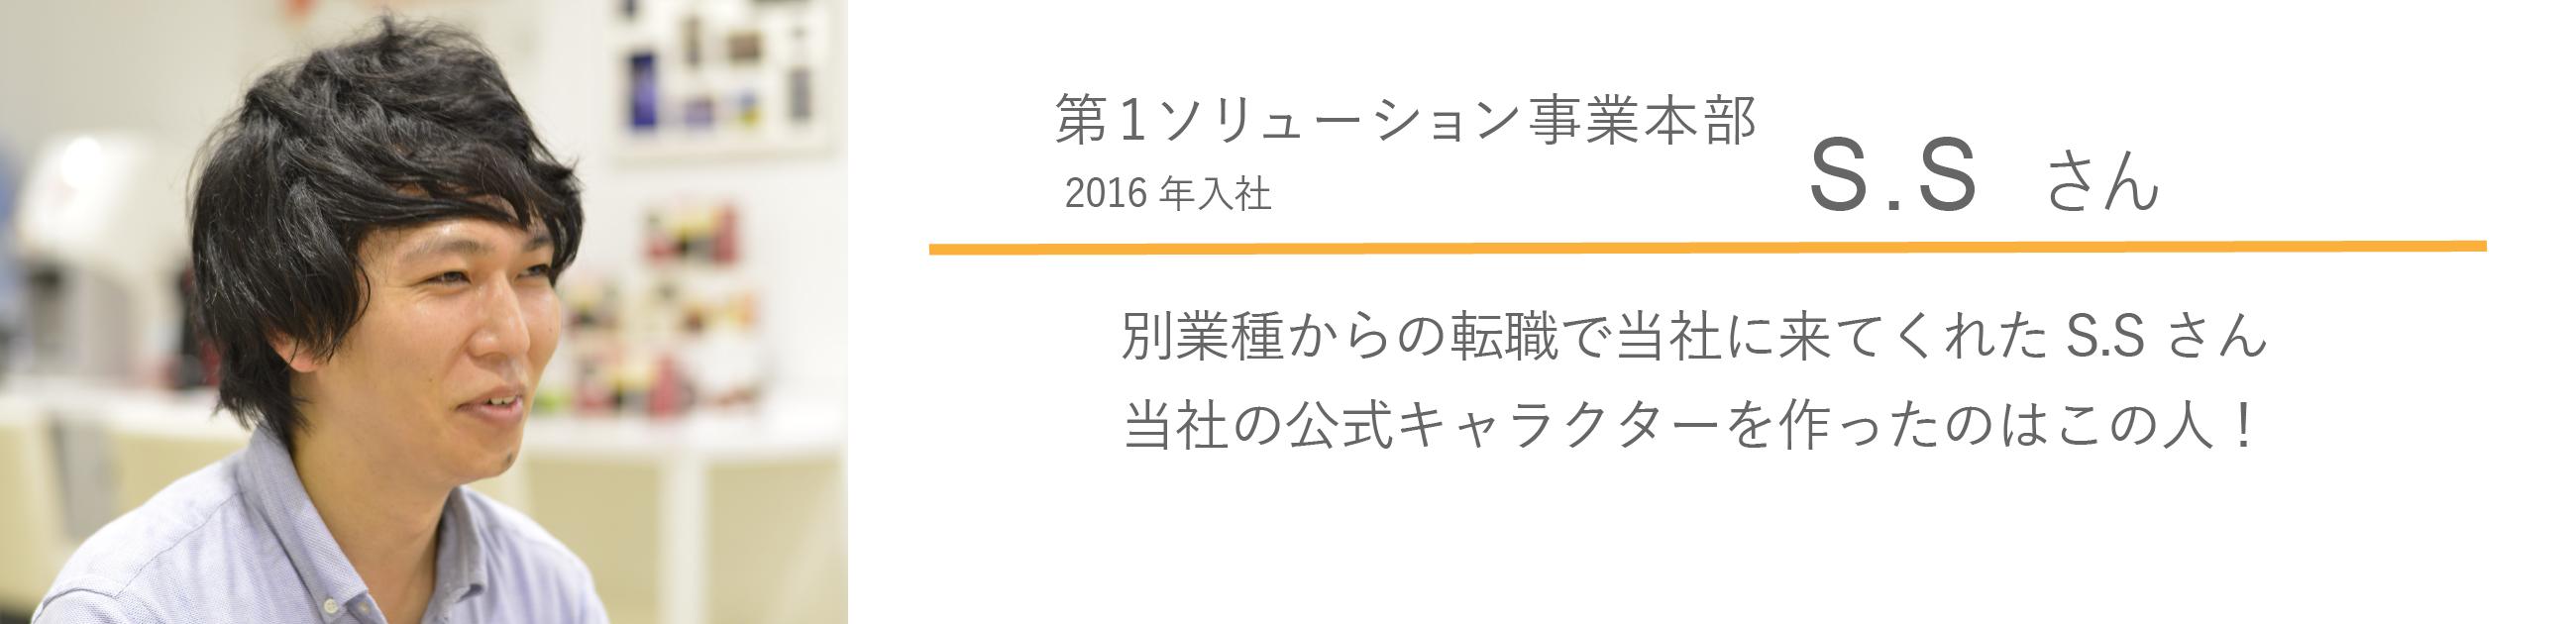 社員紹介4